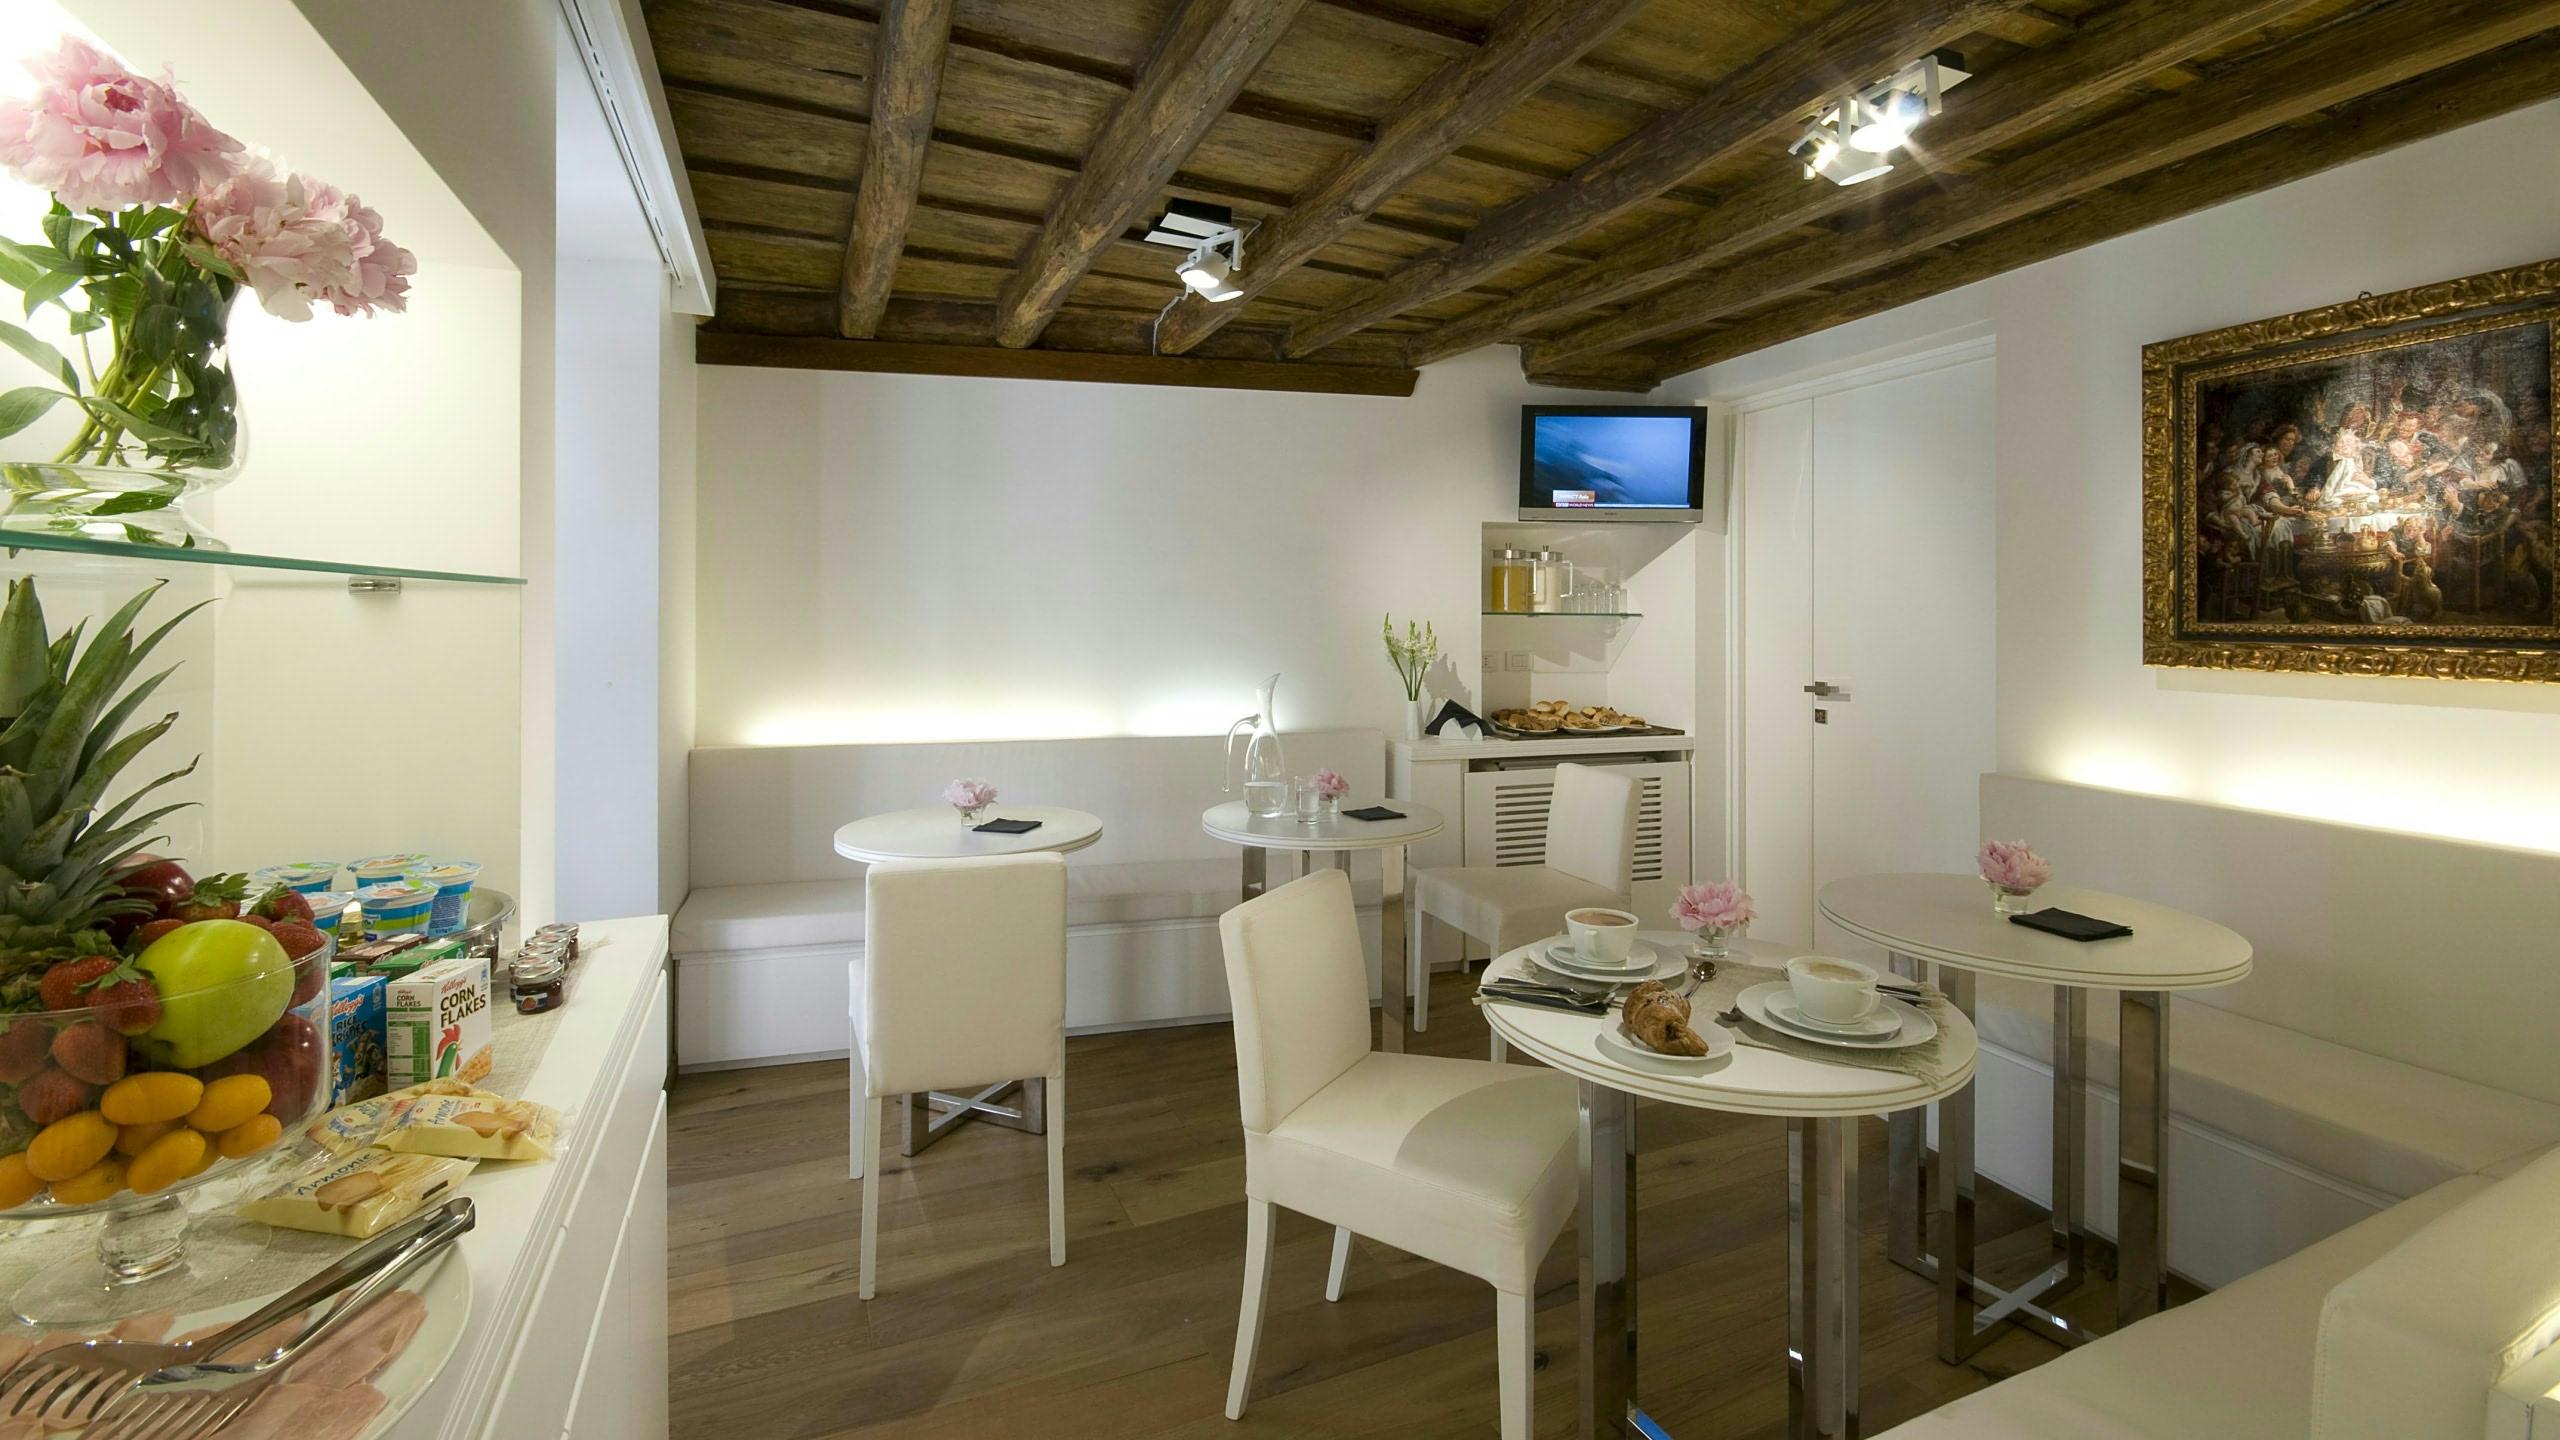 gigli-d-oro-suite-rom-breakfast-1